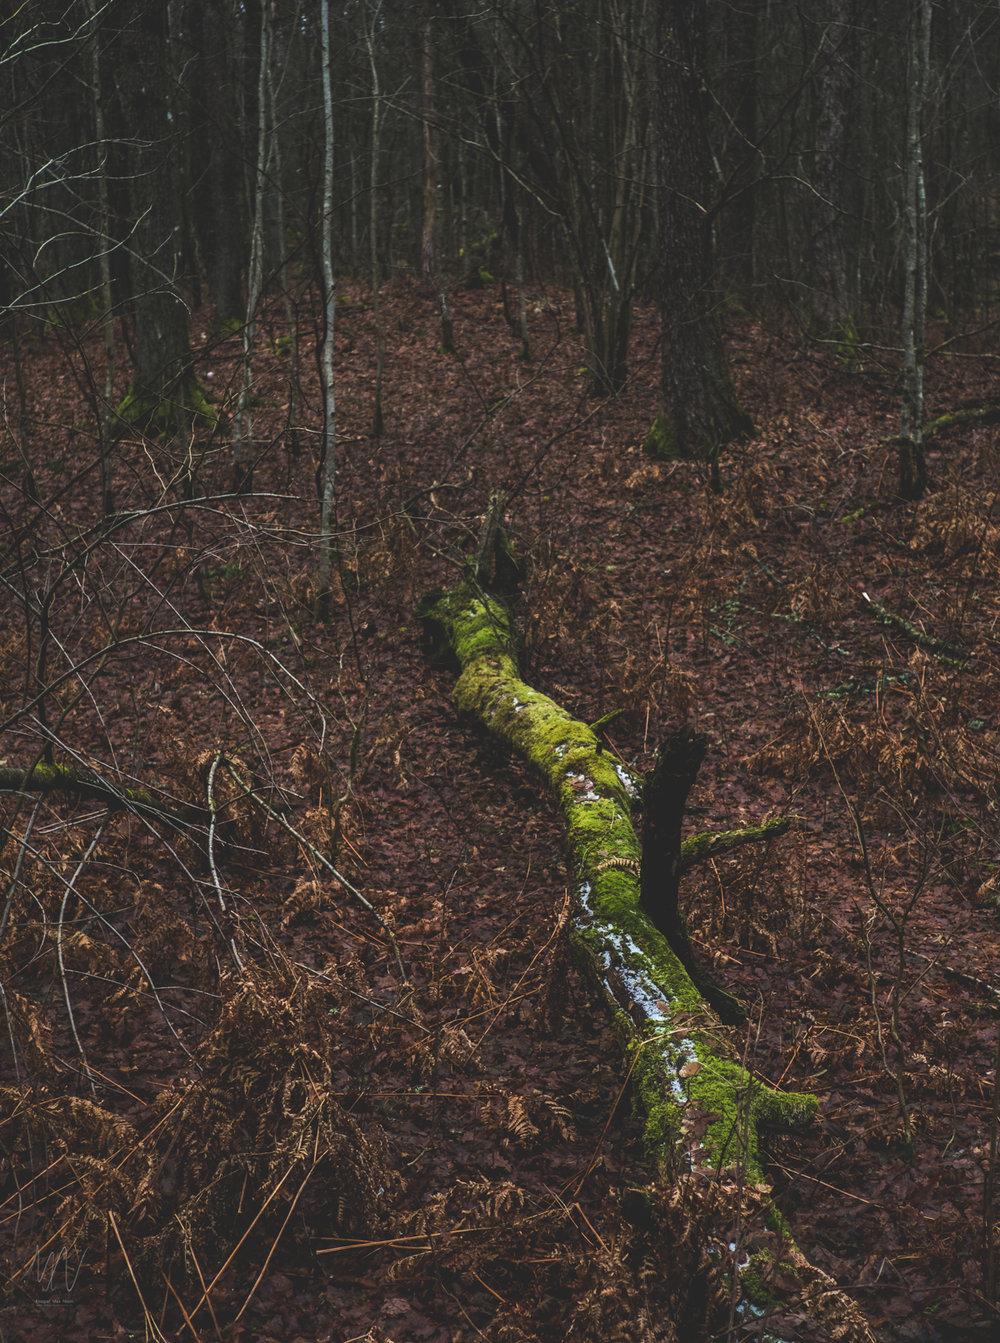 Fotograf-max-norin-fuji-x-naturfoto-1.jpg